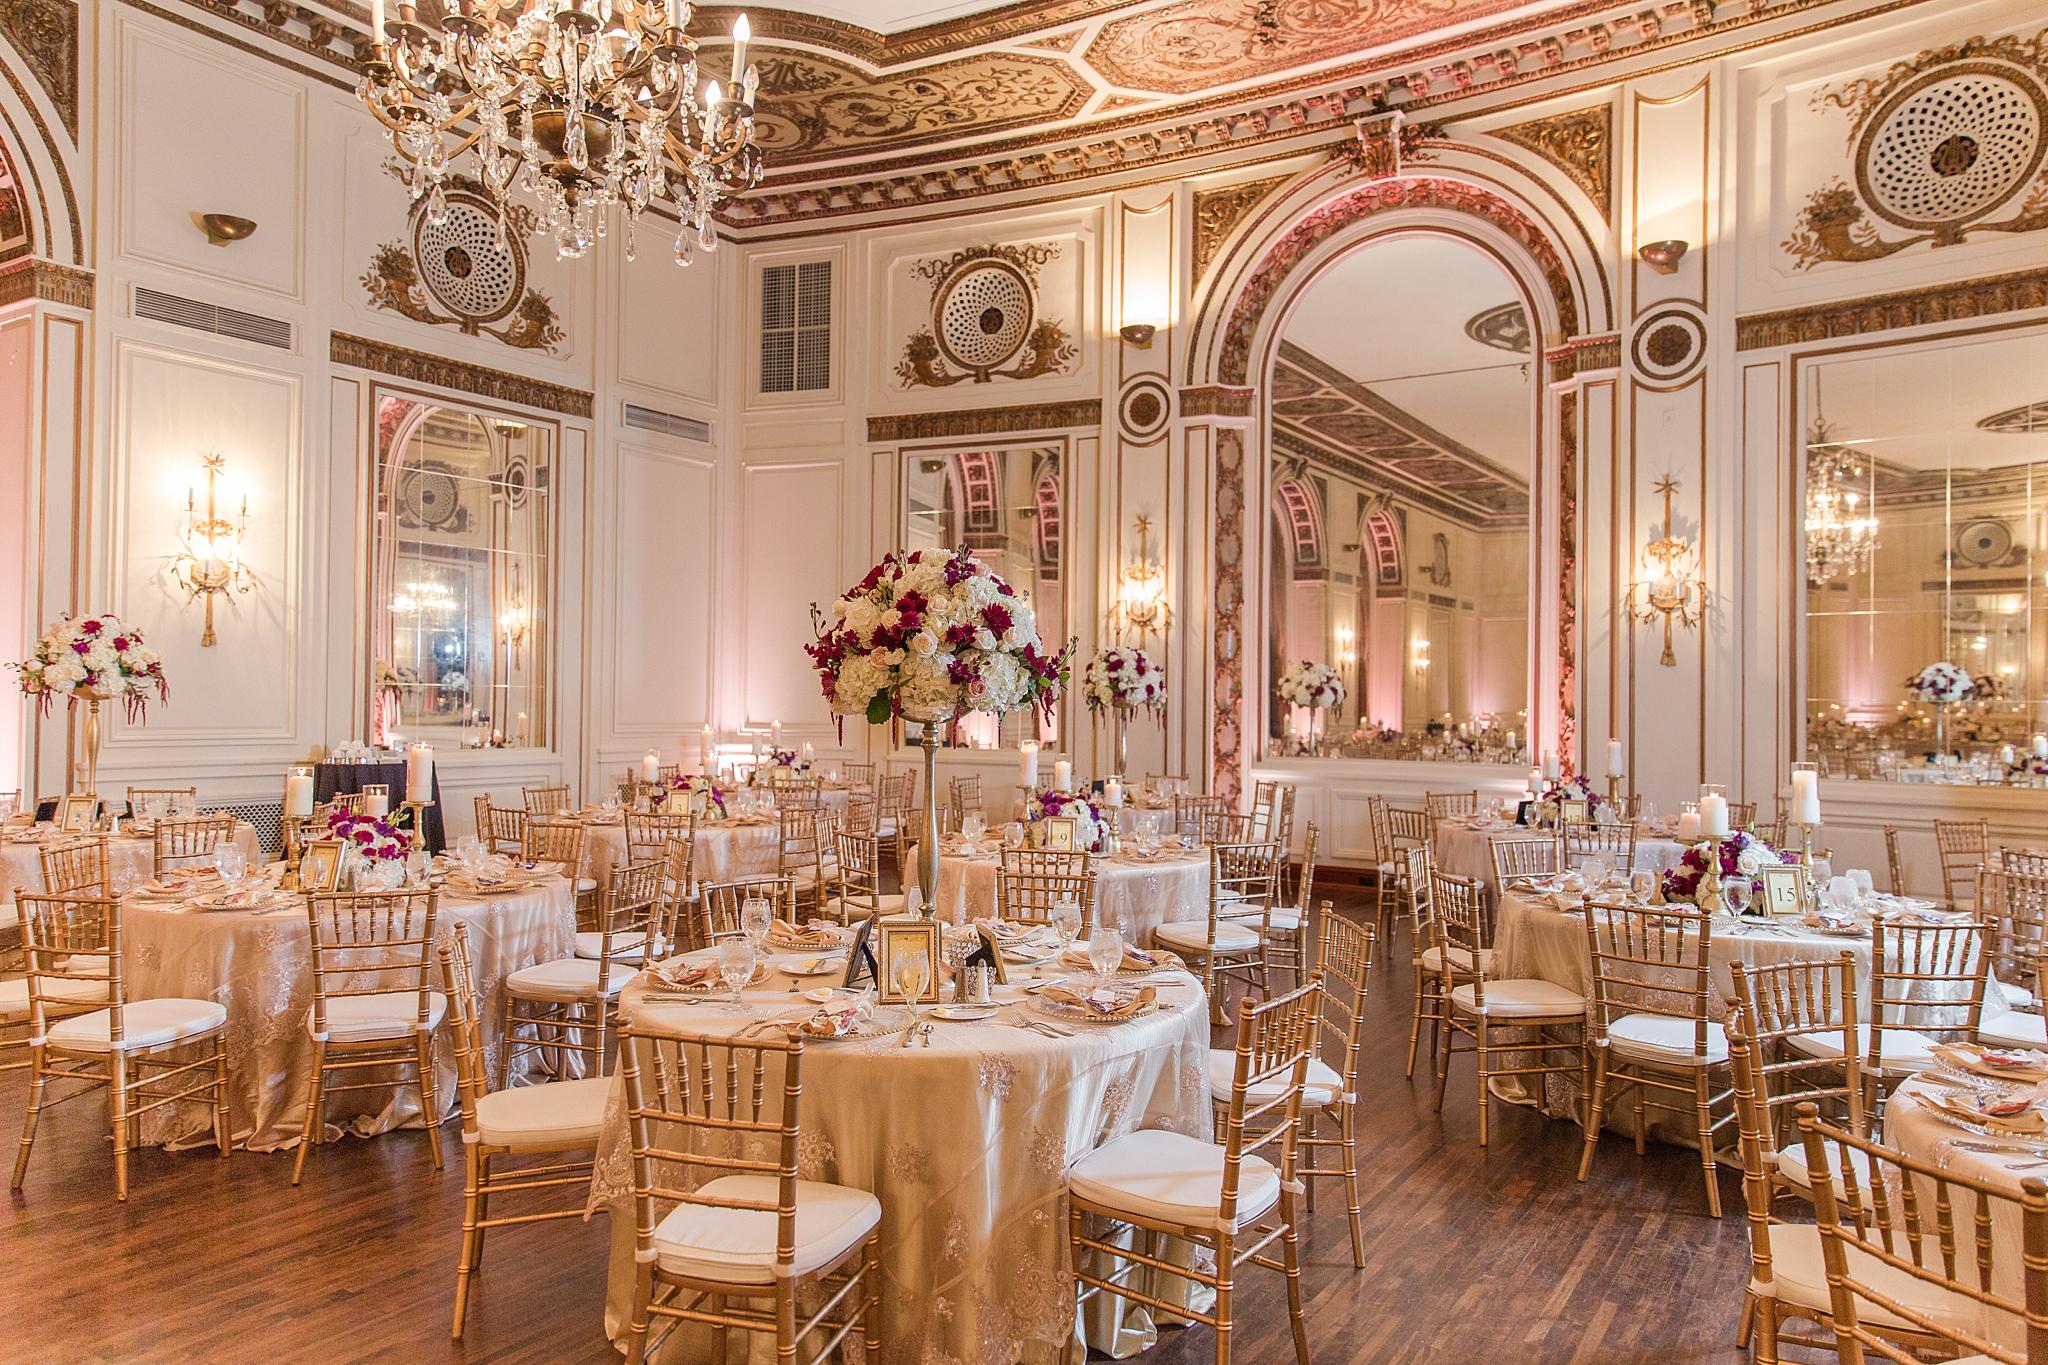 detroit-colony-club-wedding-regal-romantic-photography-in-detroit-mi-by-courtney-carolyn-photography_0036.jpg